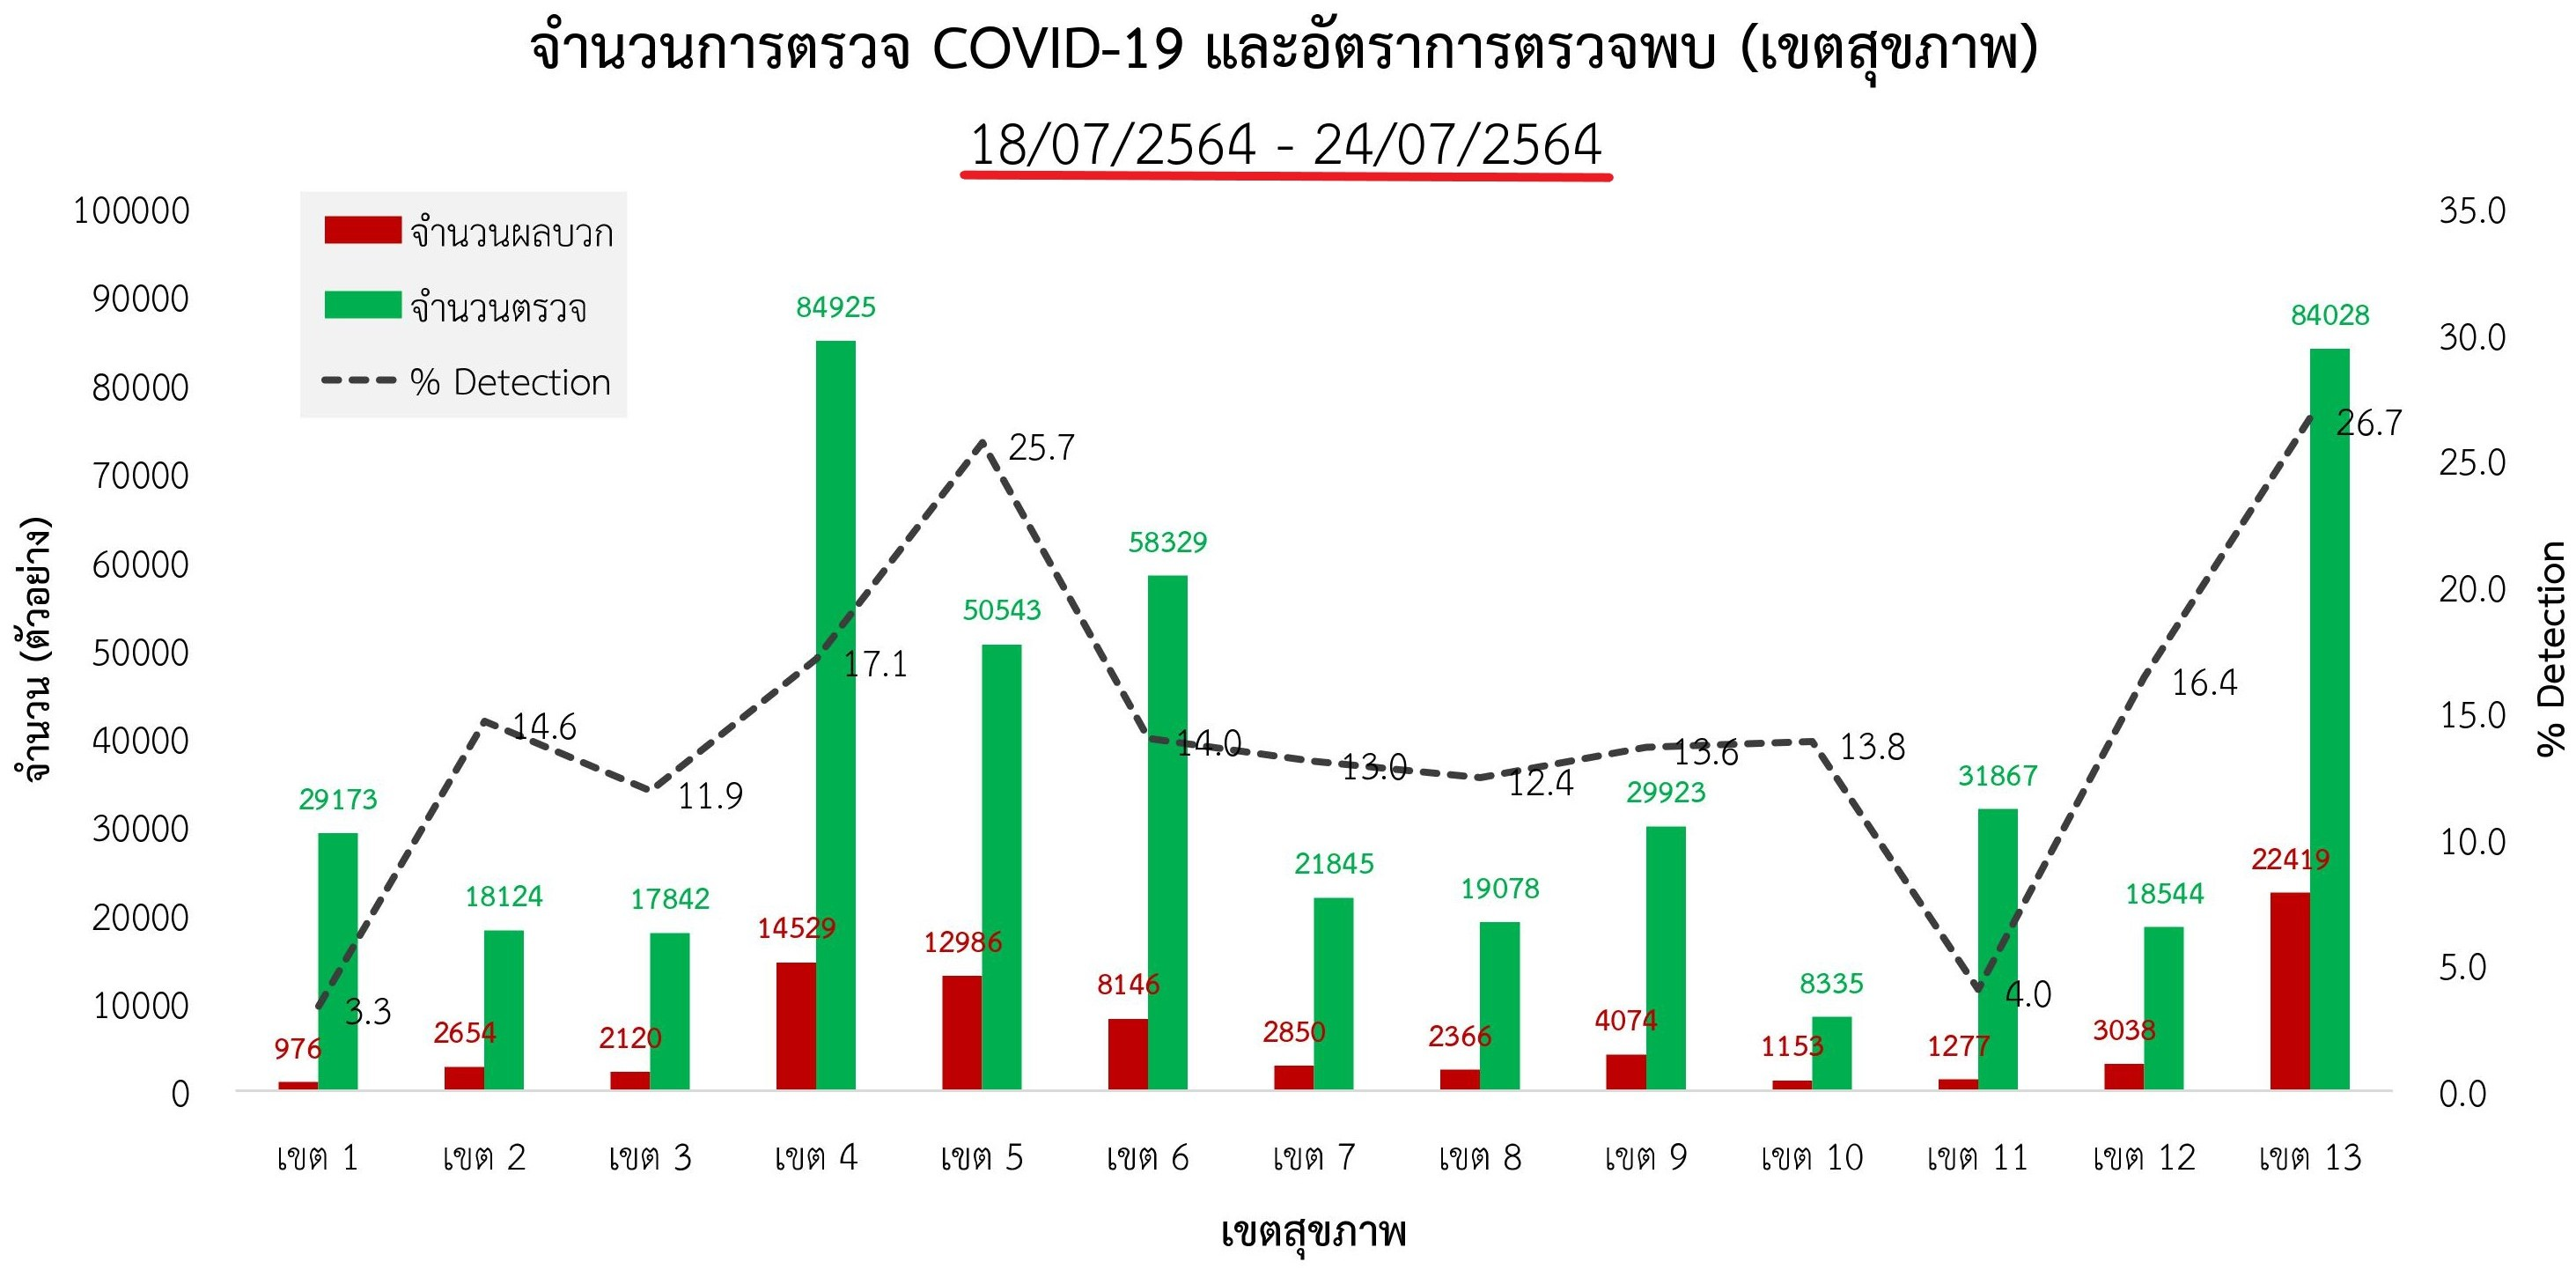 www.thaiguide.dk/images/forum/covid19/procent%20positive%20test%20regioner%201%2024-07-21.jpg